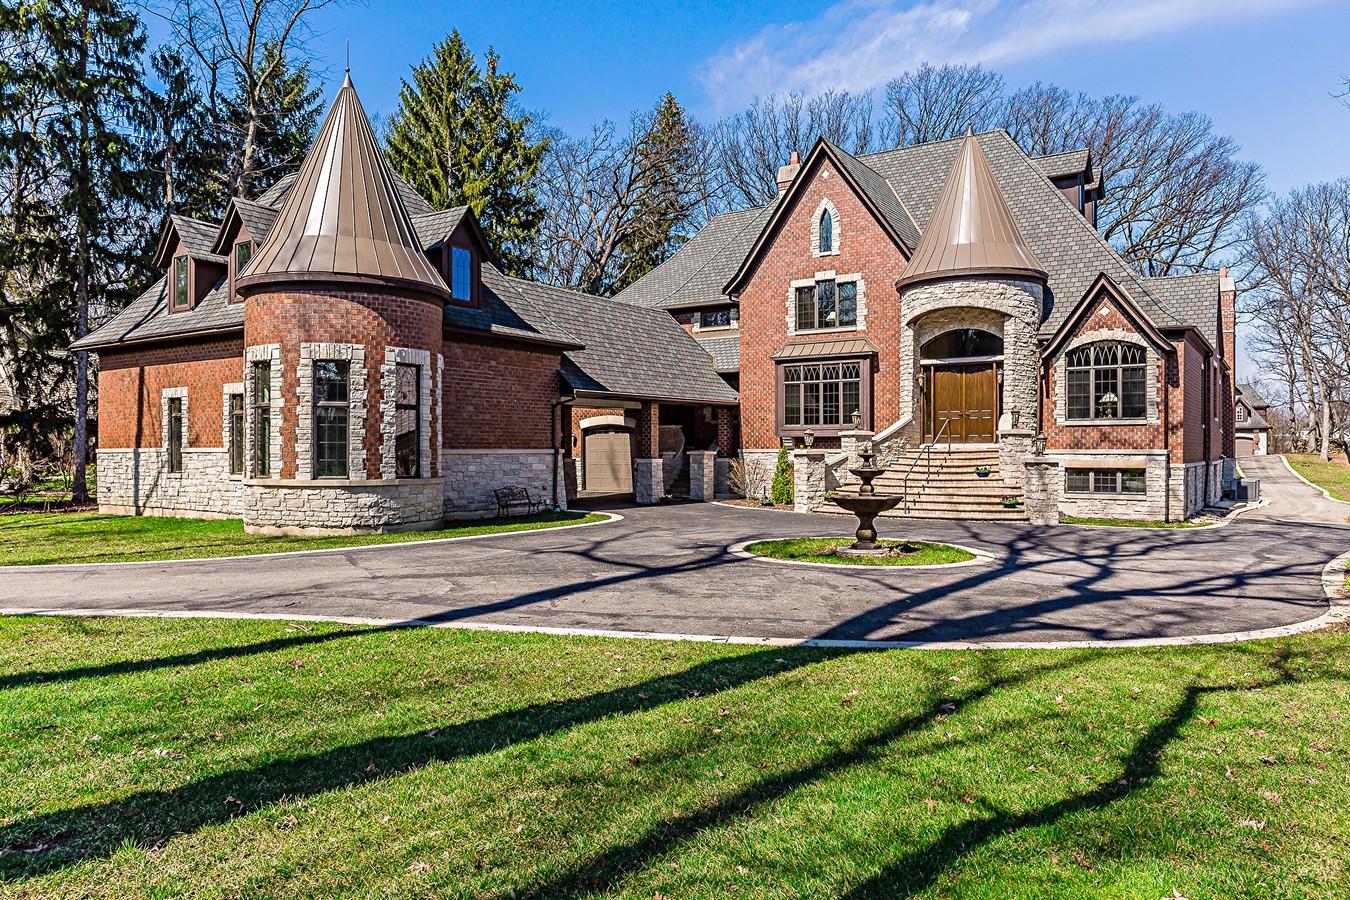 Single Family Home for Sale at 3108 White Oak Ln 3108 White Oak Lane Oak Brook, Illinois 60523 United States